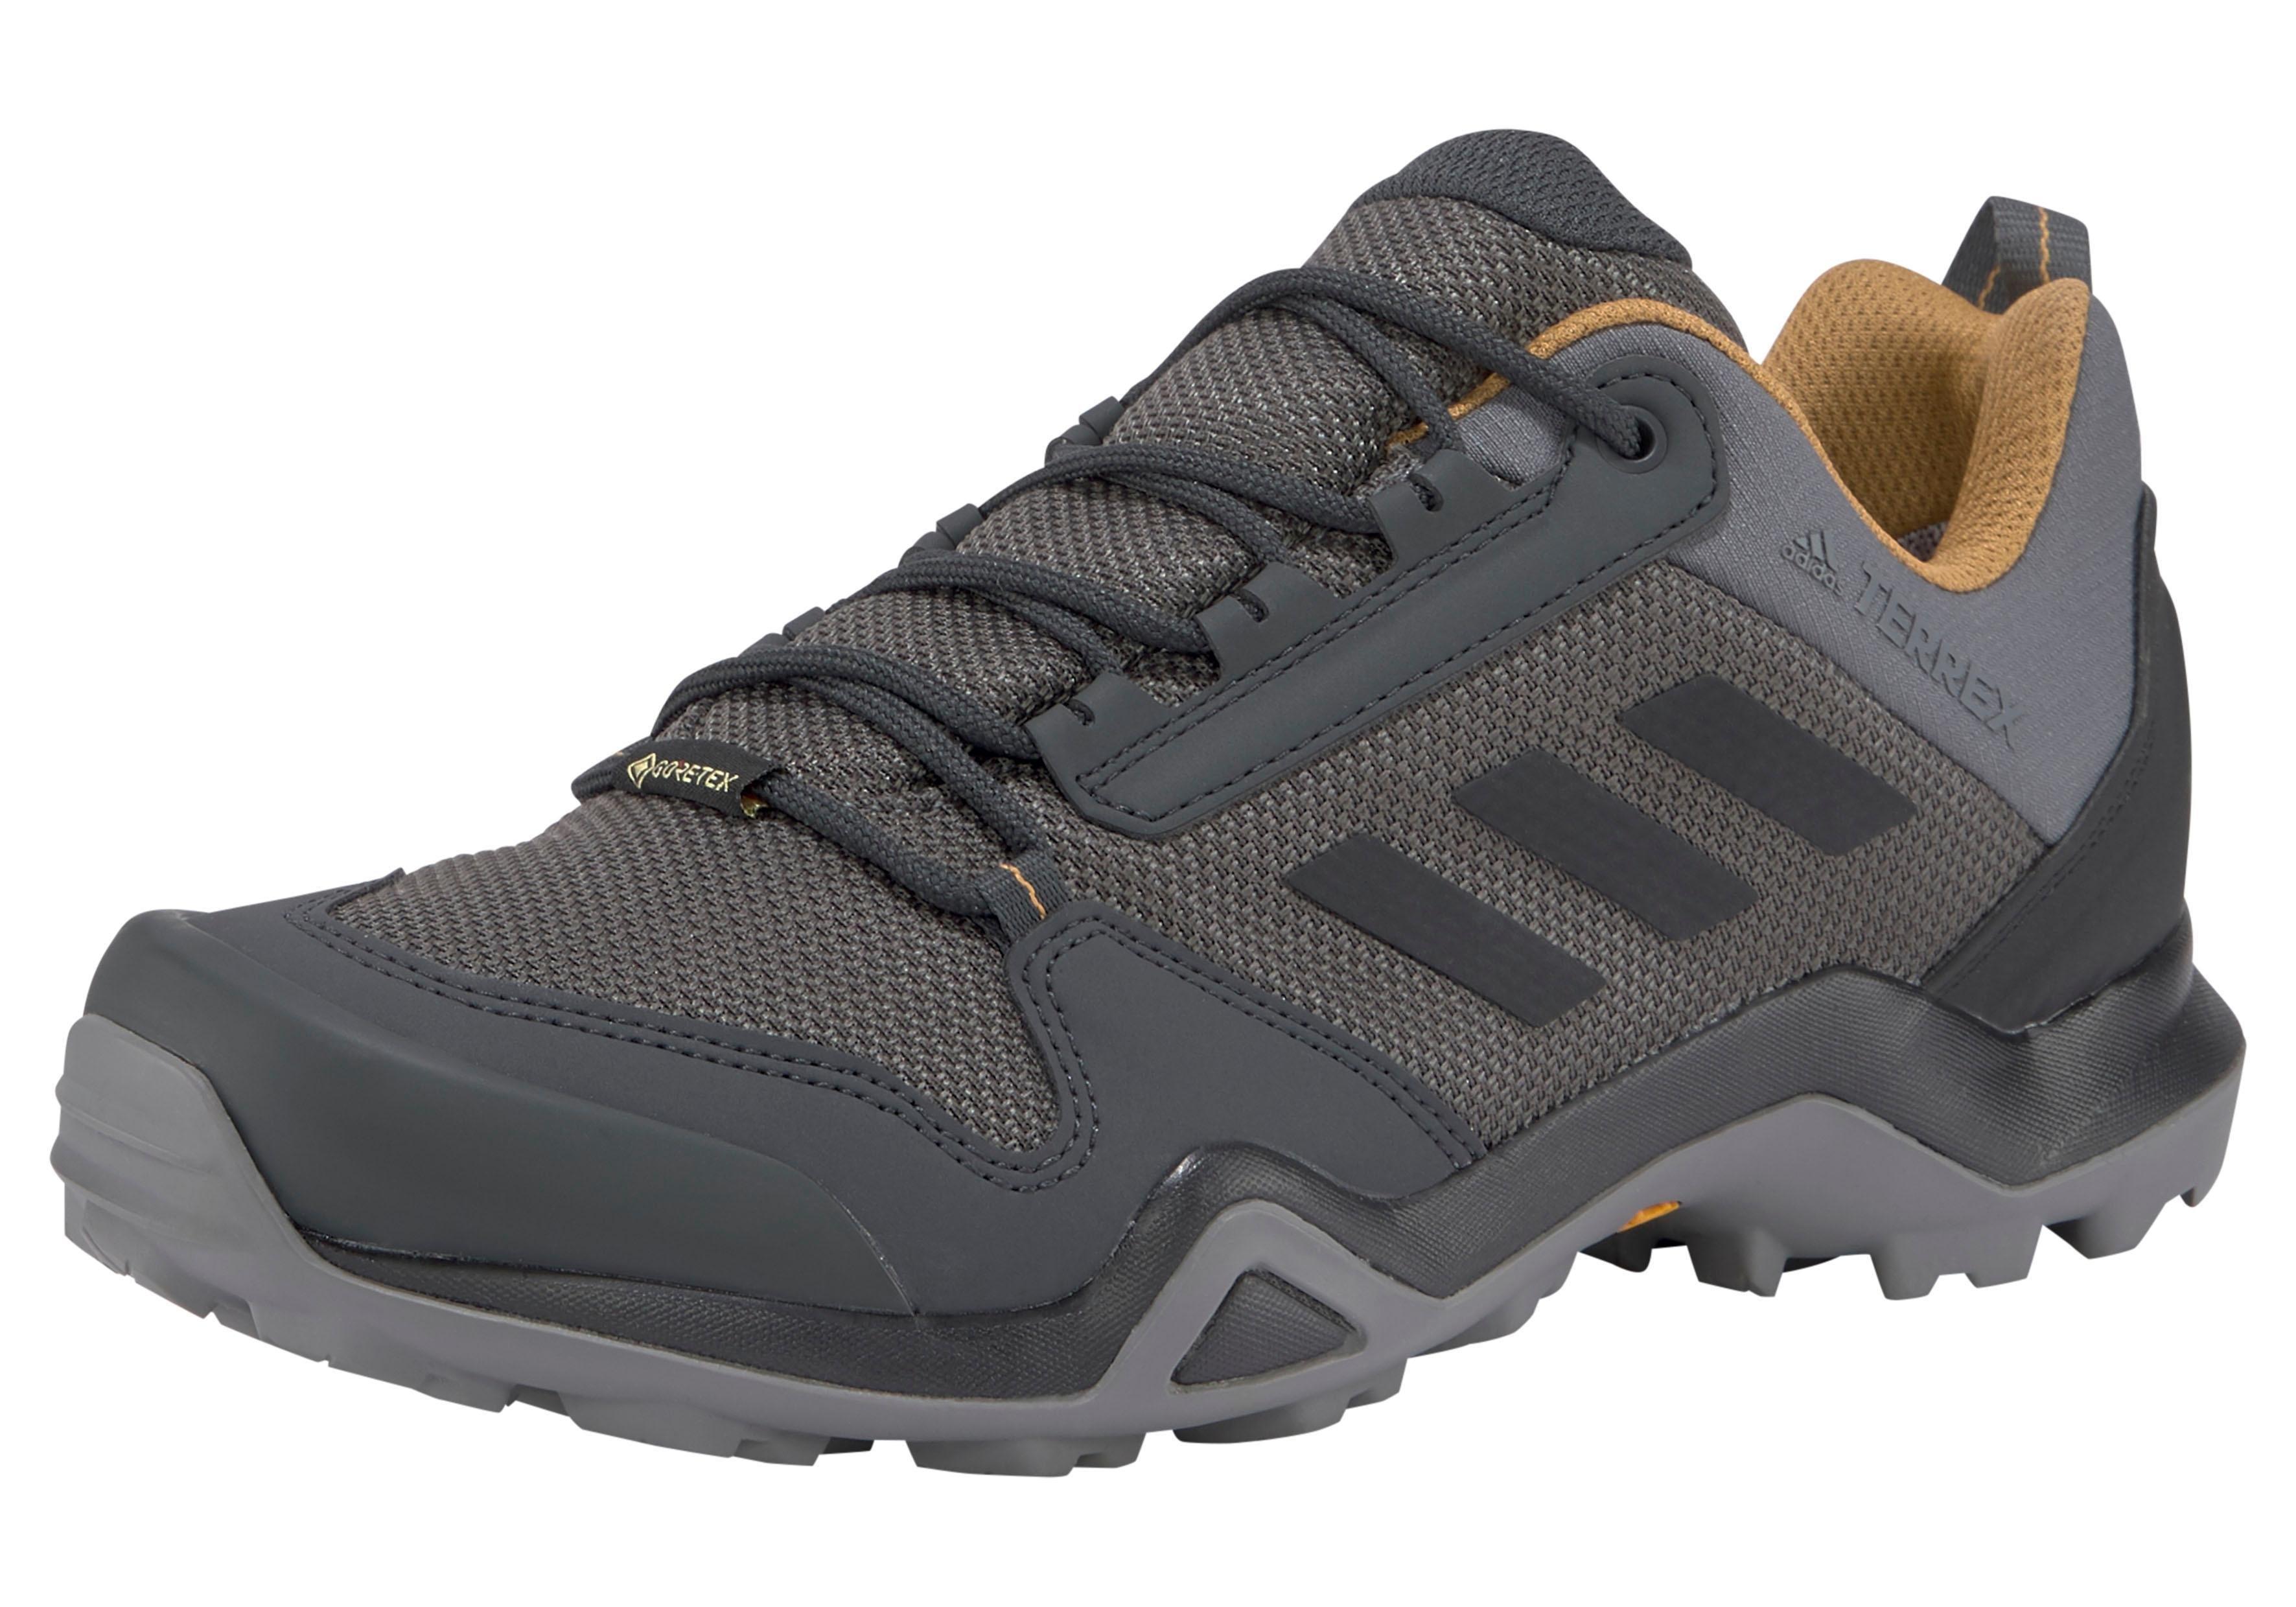 adidas Performance outdoorschoenen »Terrex AX3 Goretex« veilig op otto.nl kopen